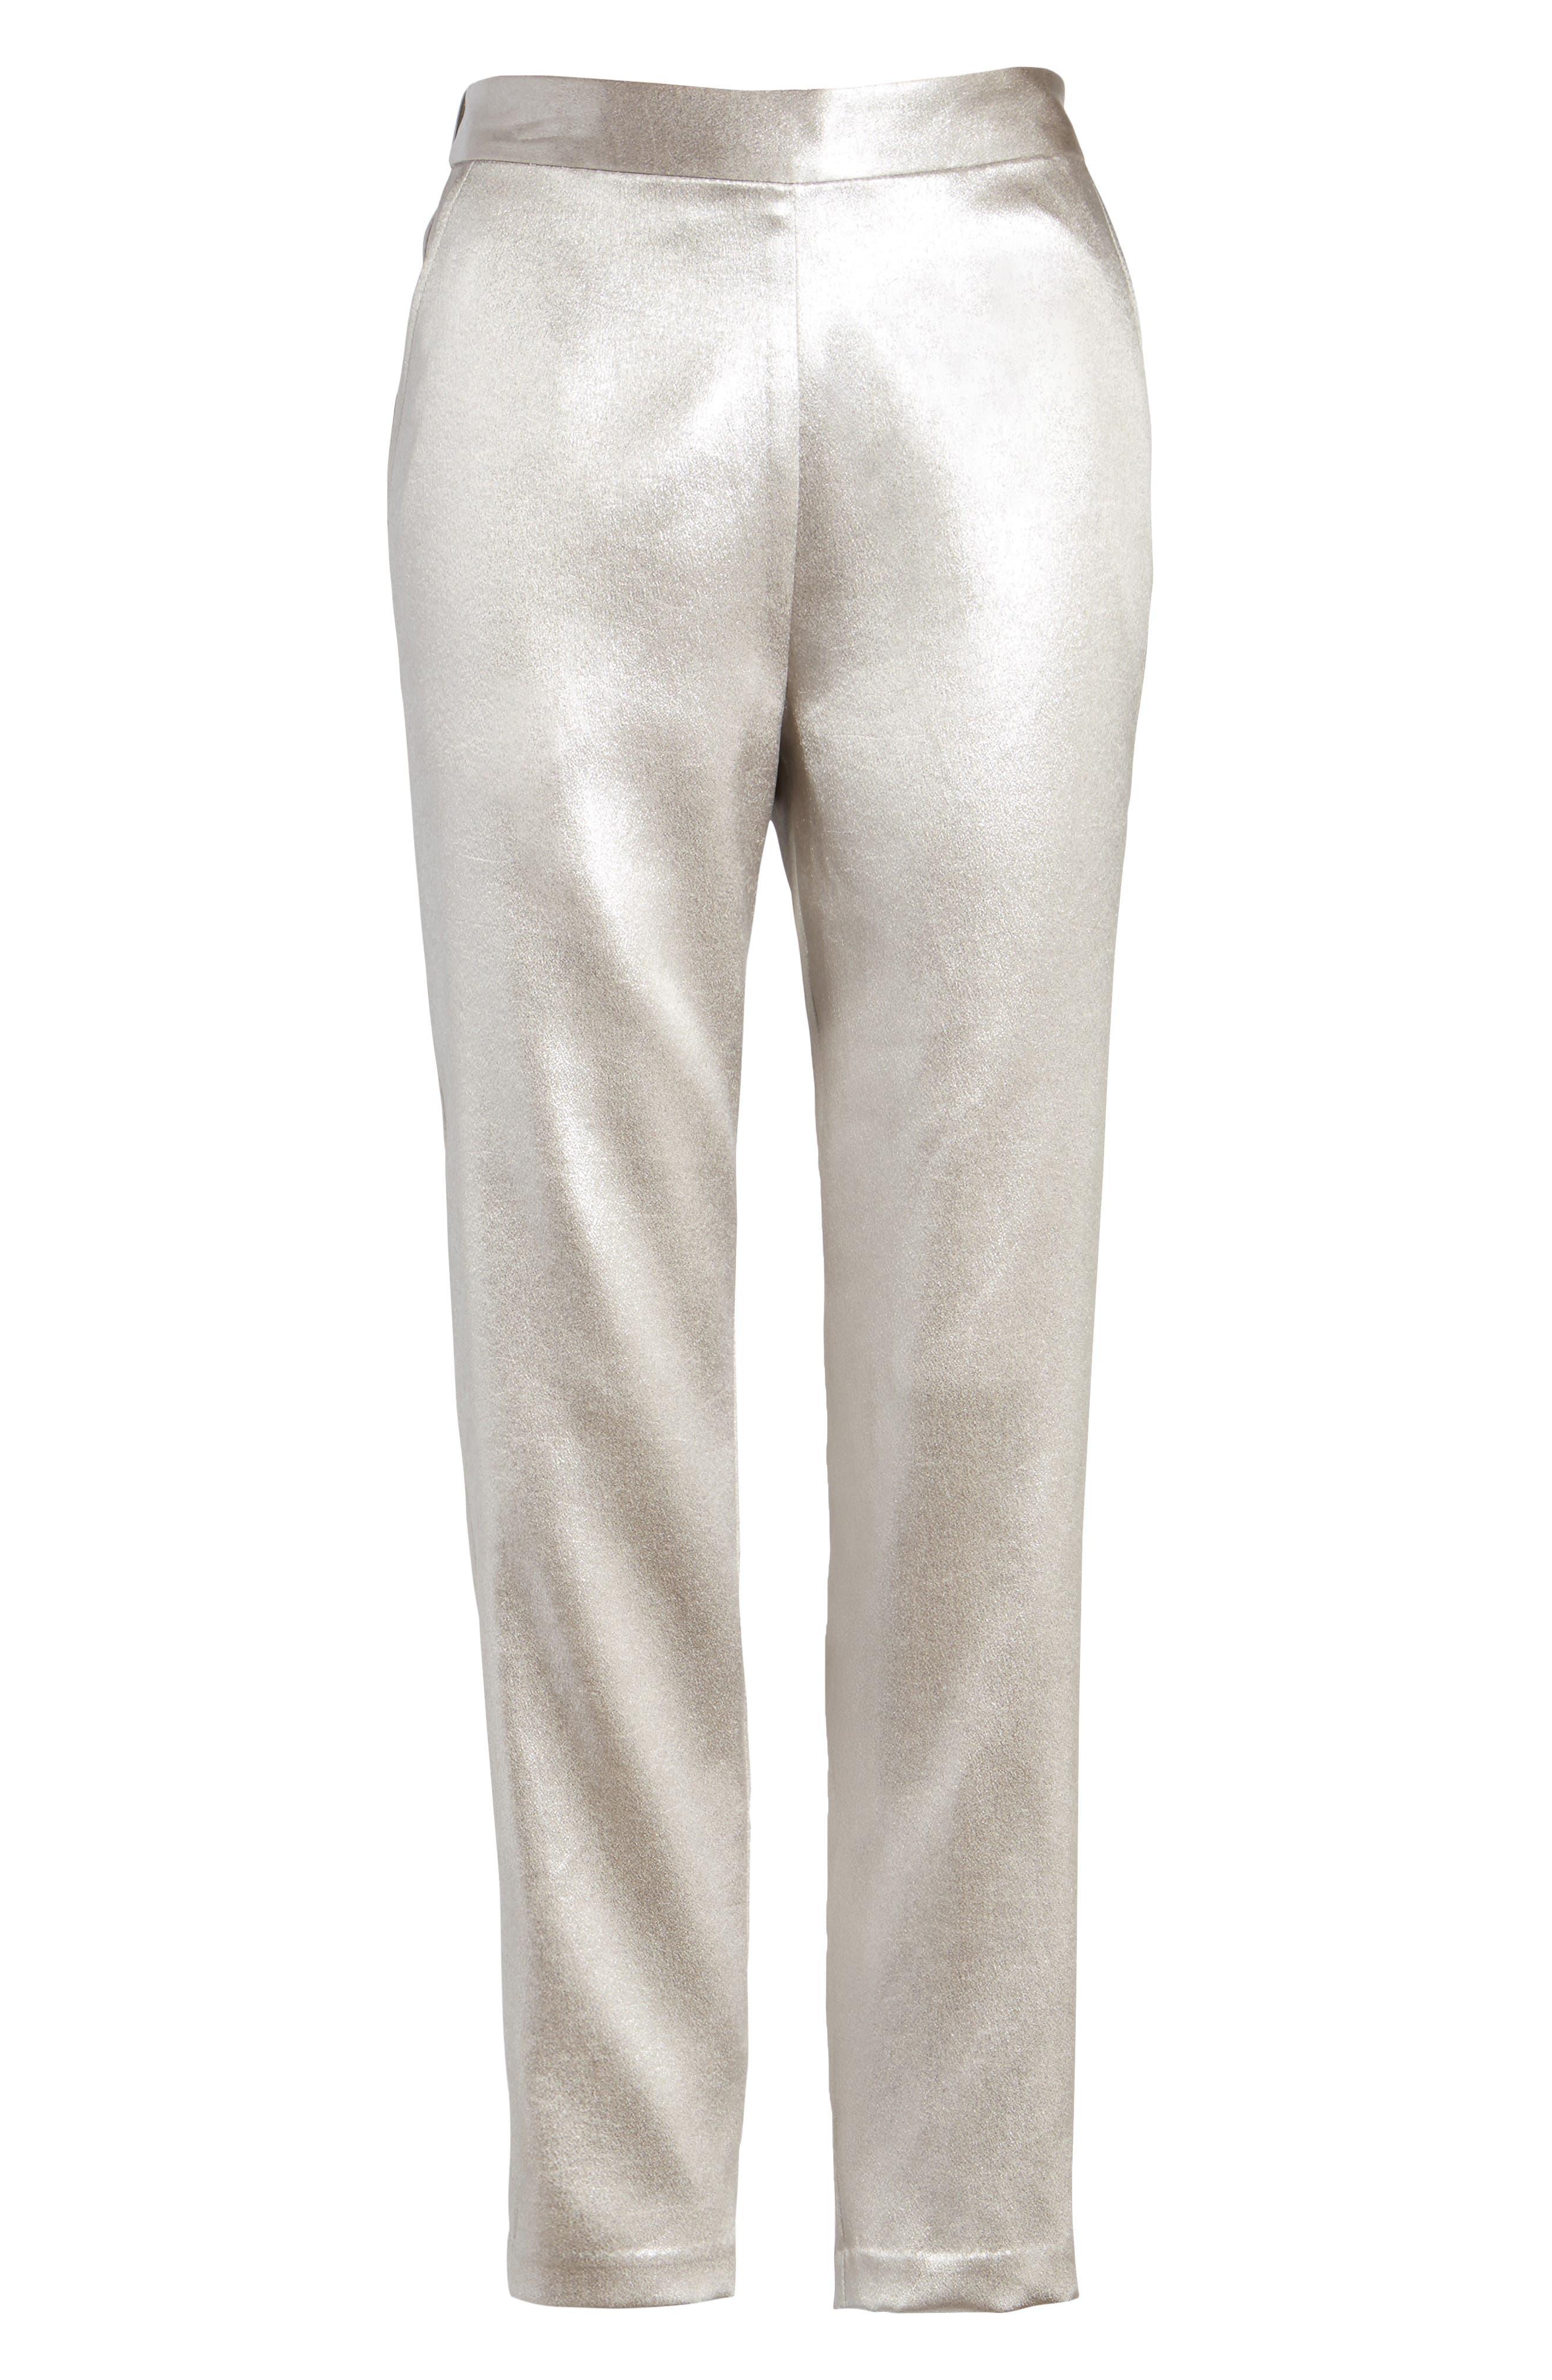 Satin High Waist Ankle Pants,                             Alternate thumbnail 7, color,                             Grey Chateau Metallic